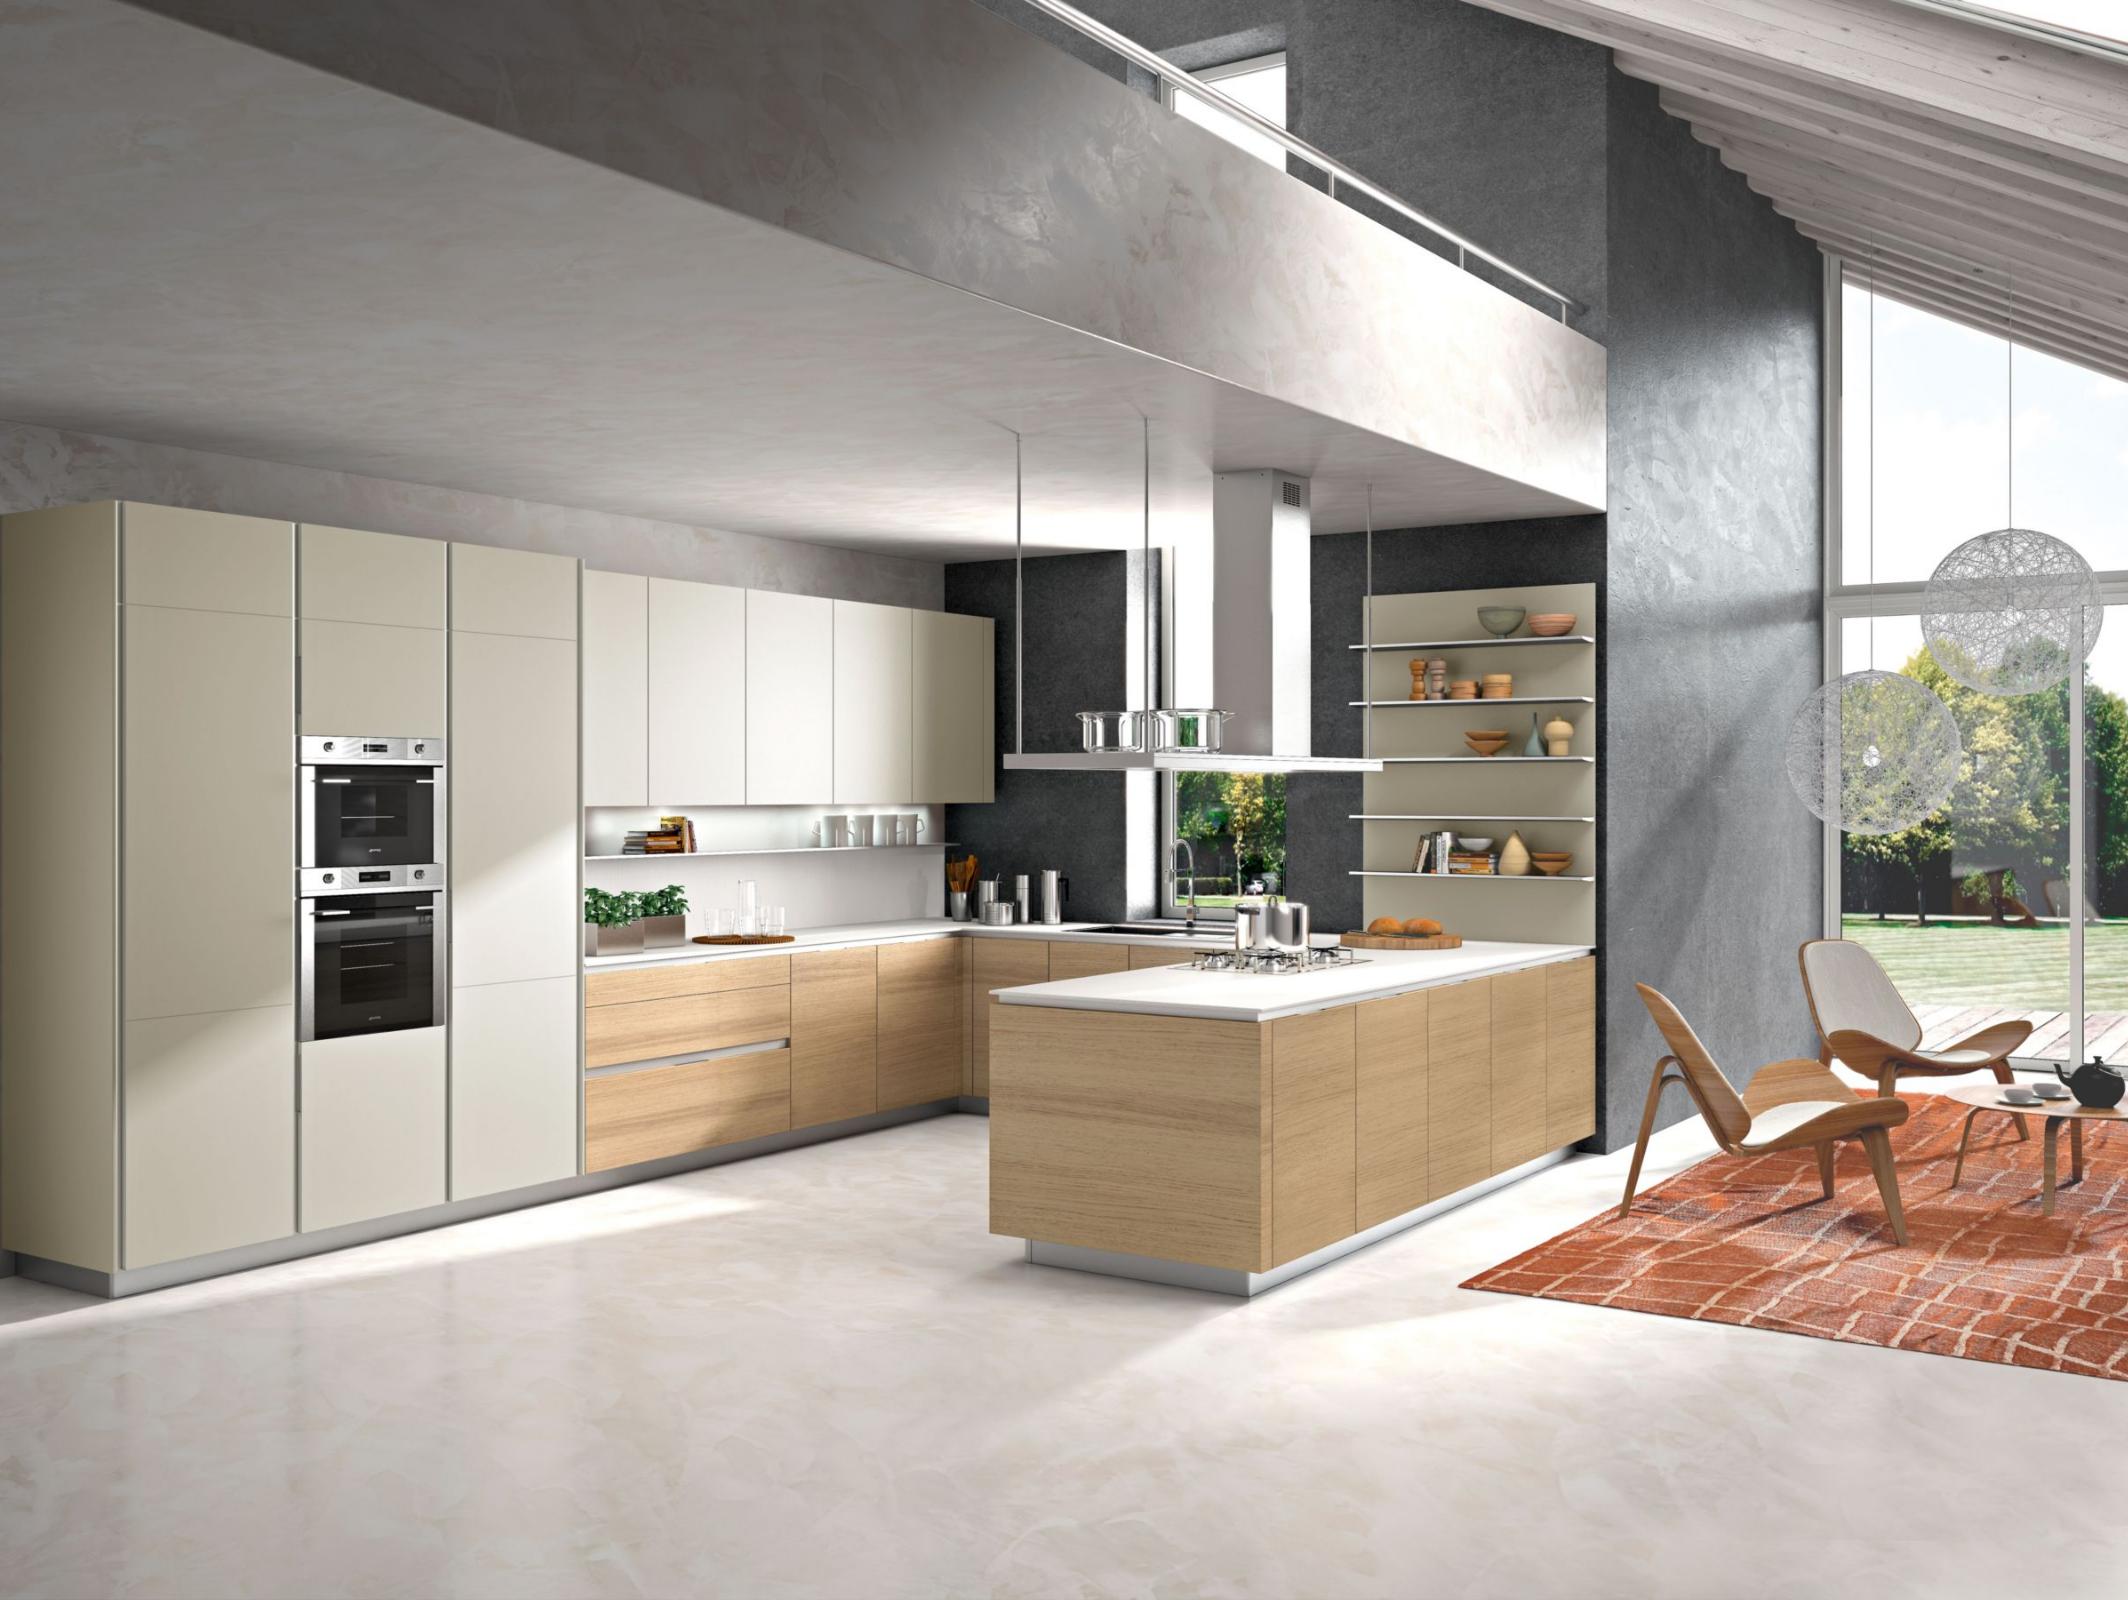 Miton Kitchens Los Angeles Ca Modern Kitchens Lwid Kitchen Furniture Modern Kitchen Kitchen Design